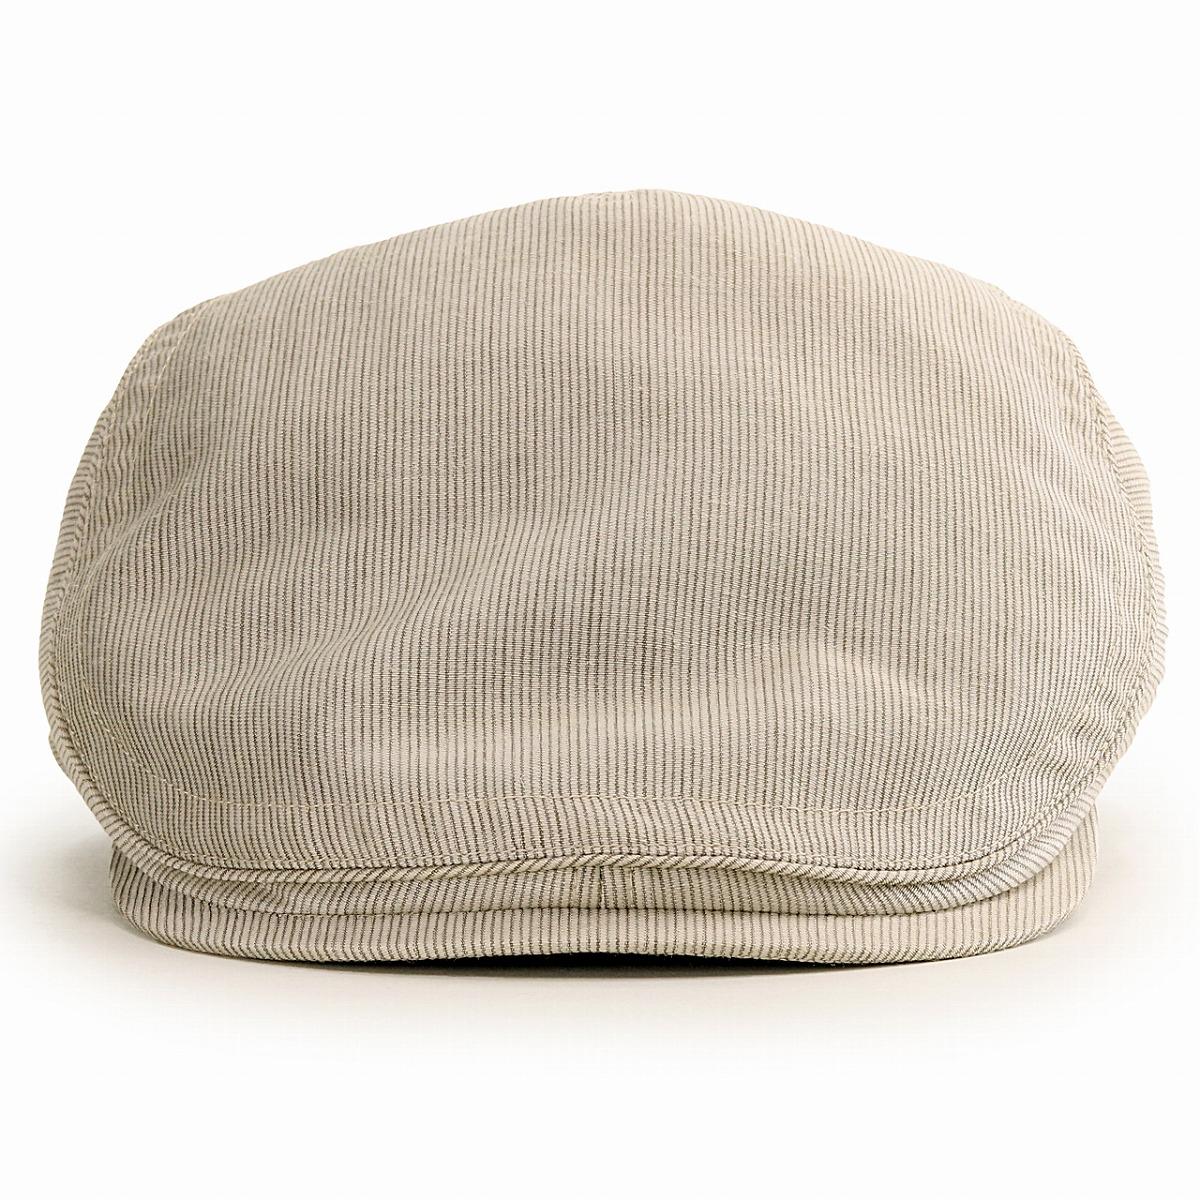 95378d782ad Mila Schon hat stripe Mila Schon hunting cap men S M L LL hunting cap hat  gentleman big size Lamy dobby hemp product made in cool hunting cap hat  Lady s ...